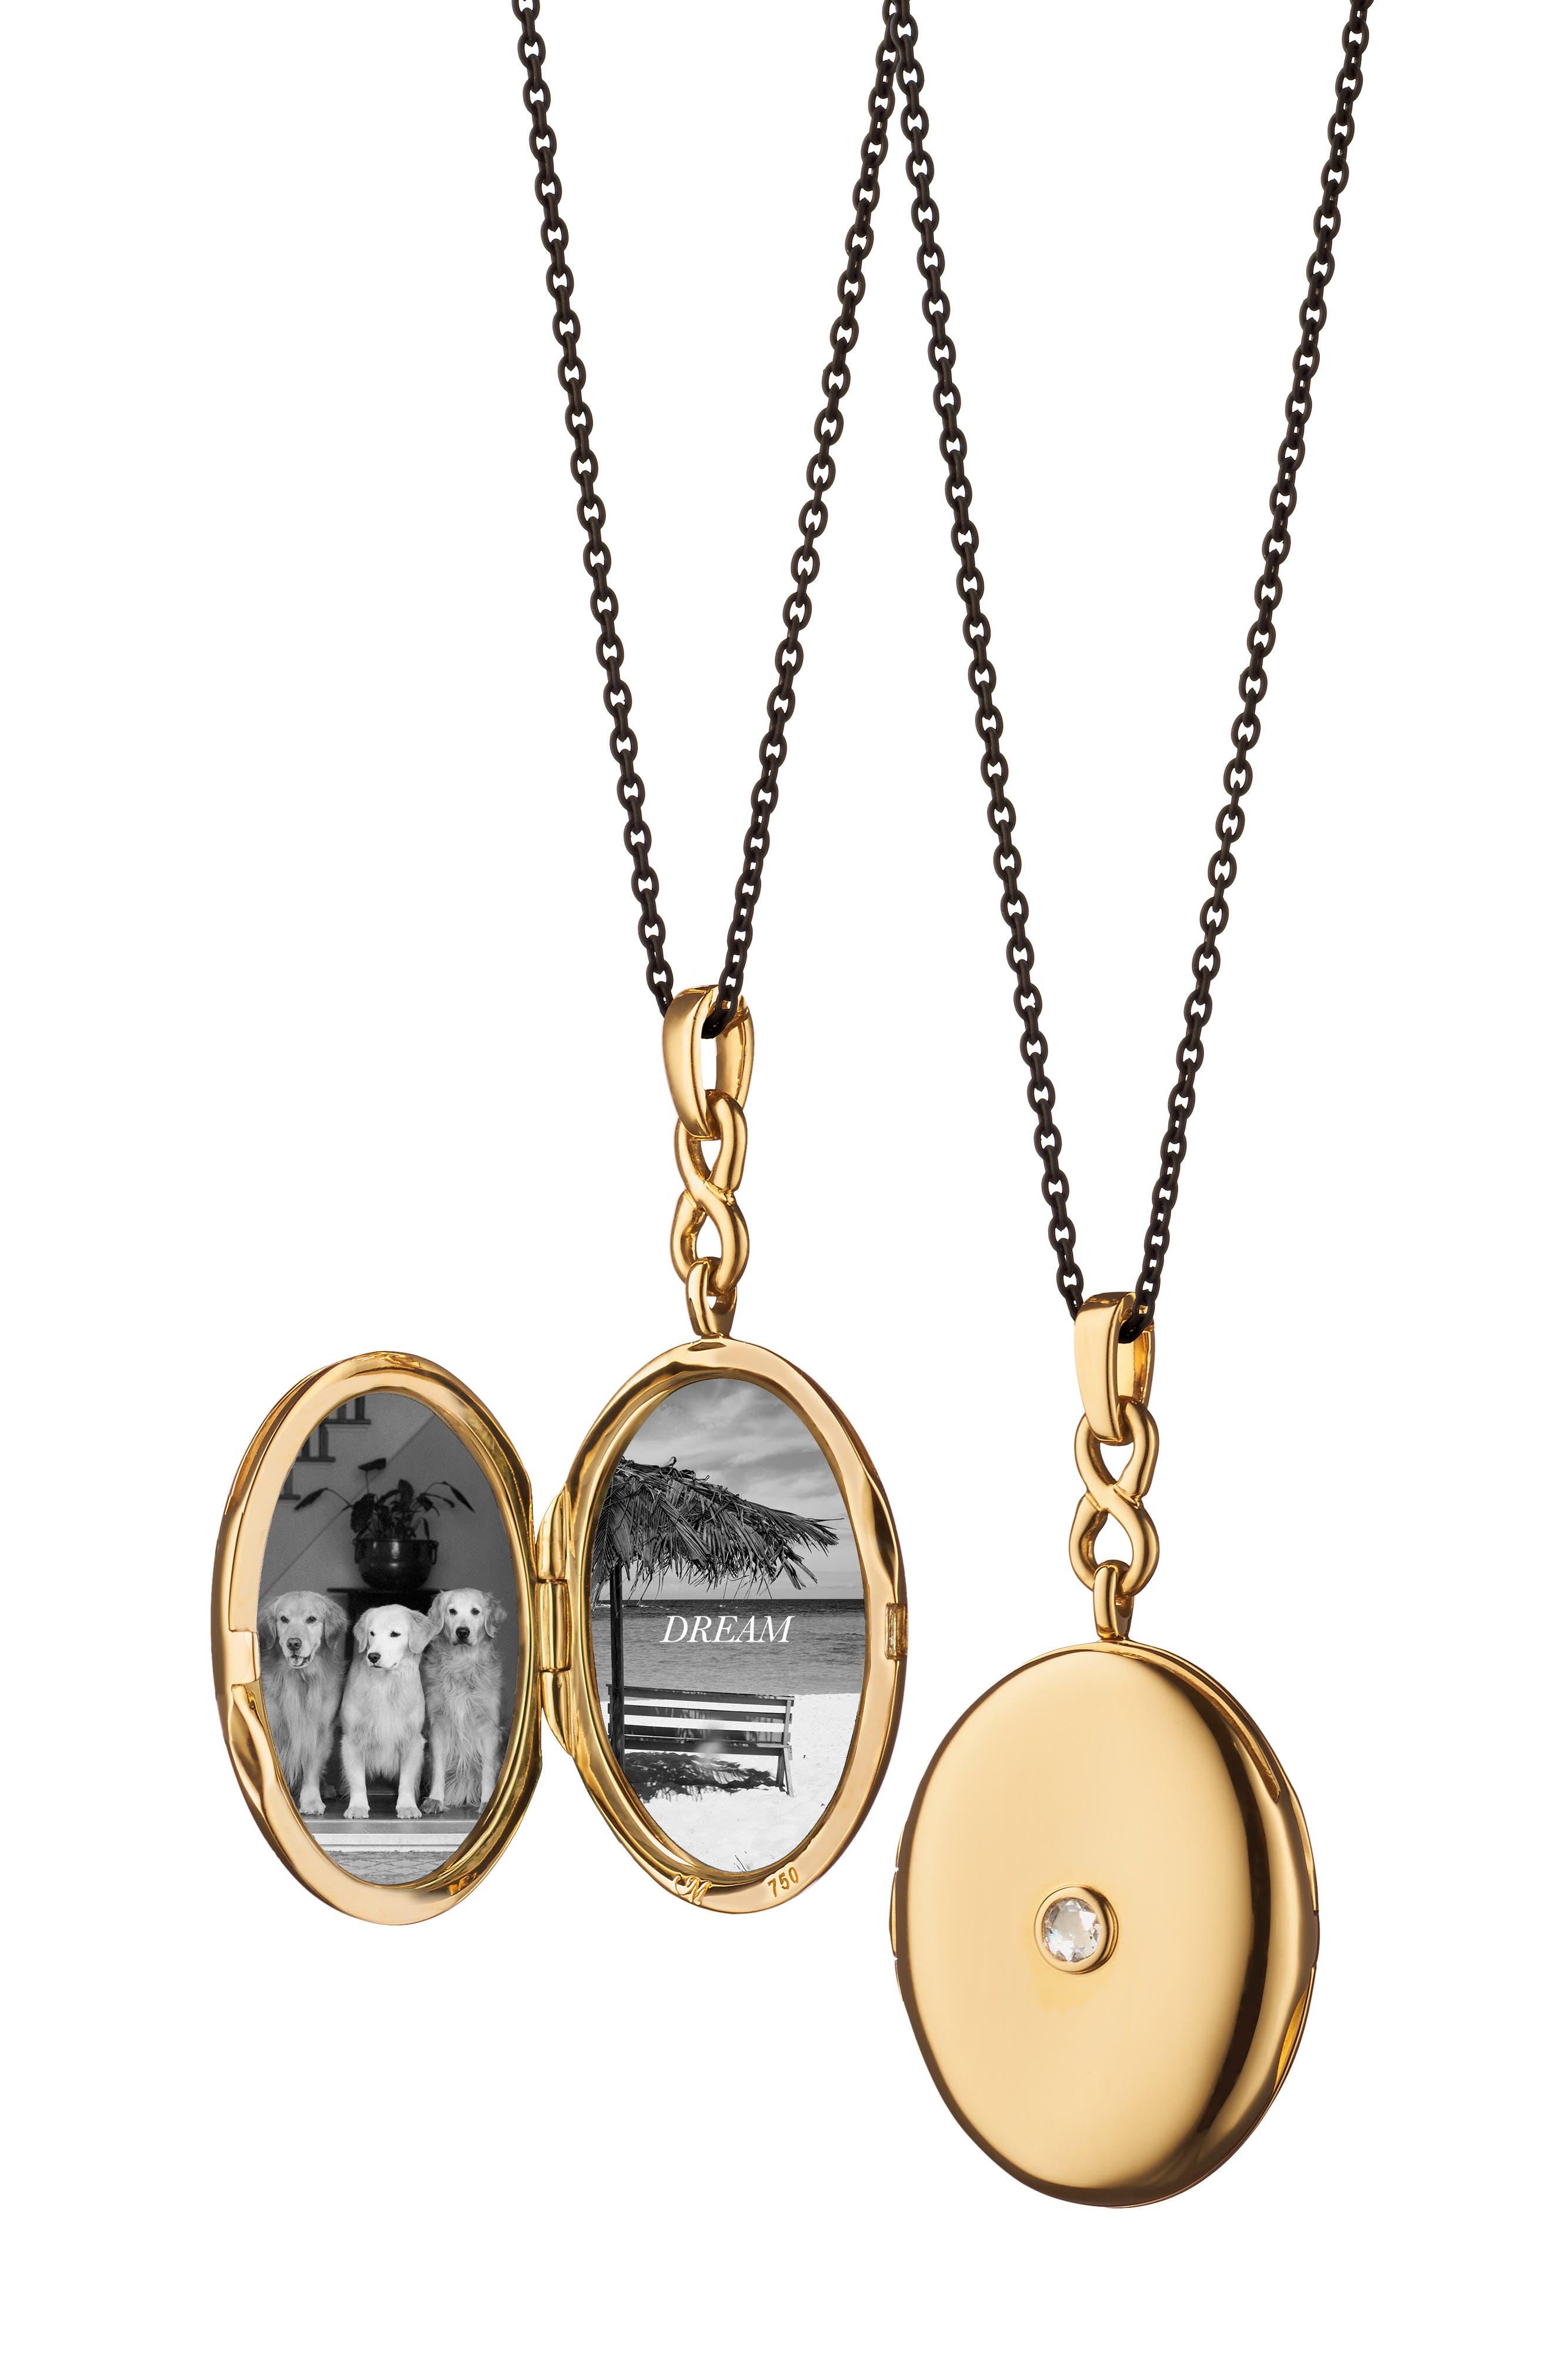 MONICA RICH KOSANN 18K Gold Locket Necklace With Diamond Center in Yellow Gold